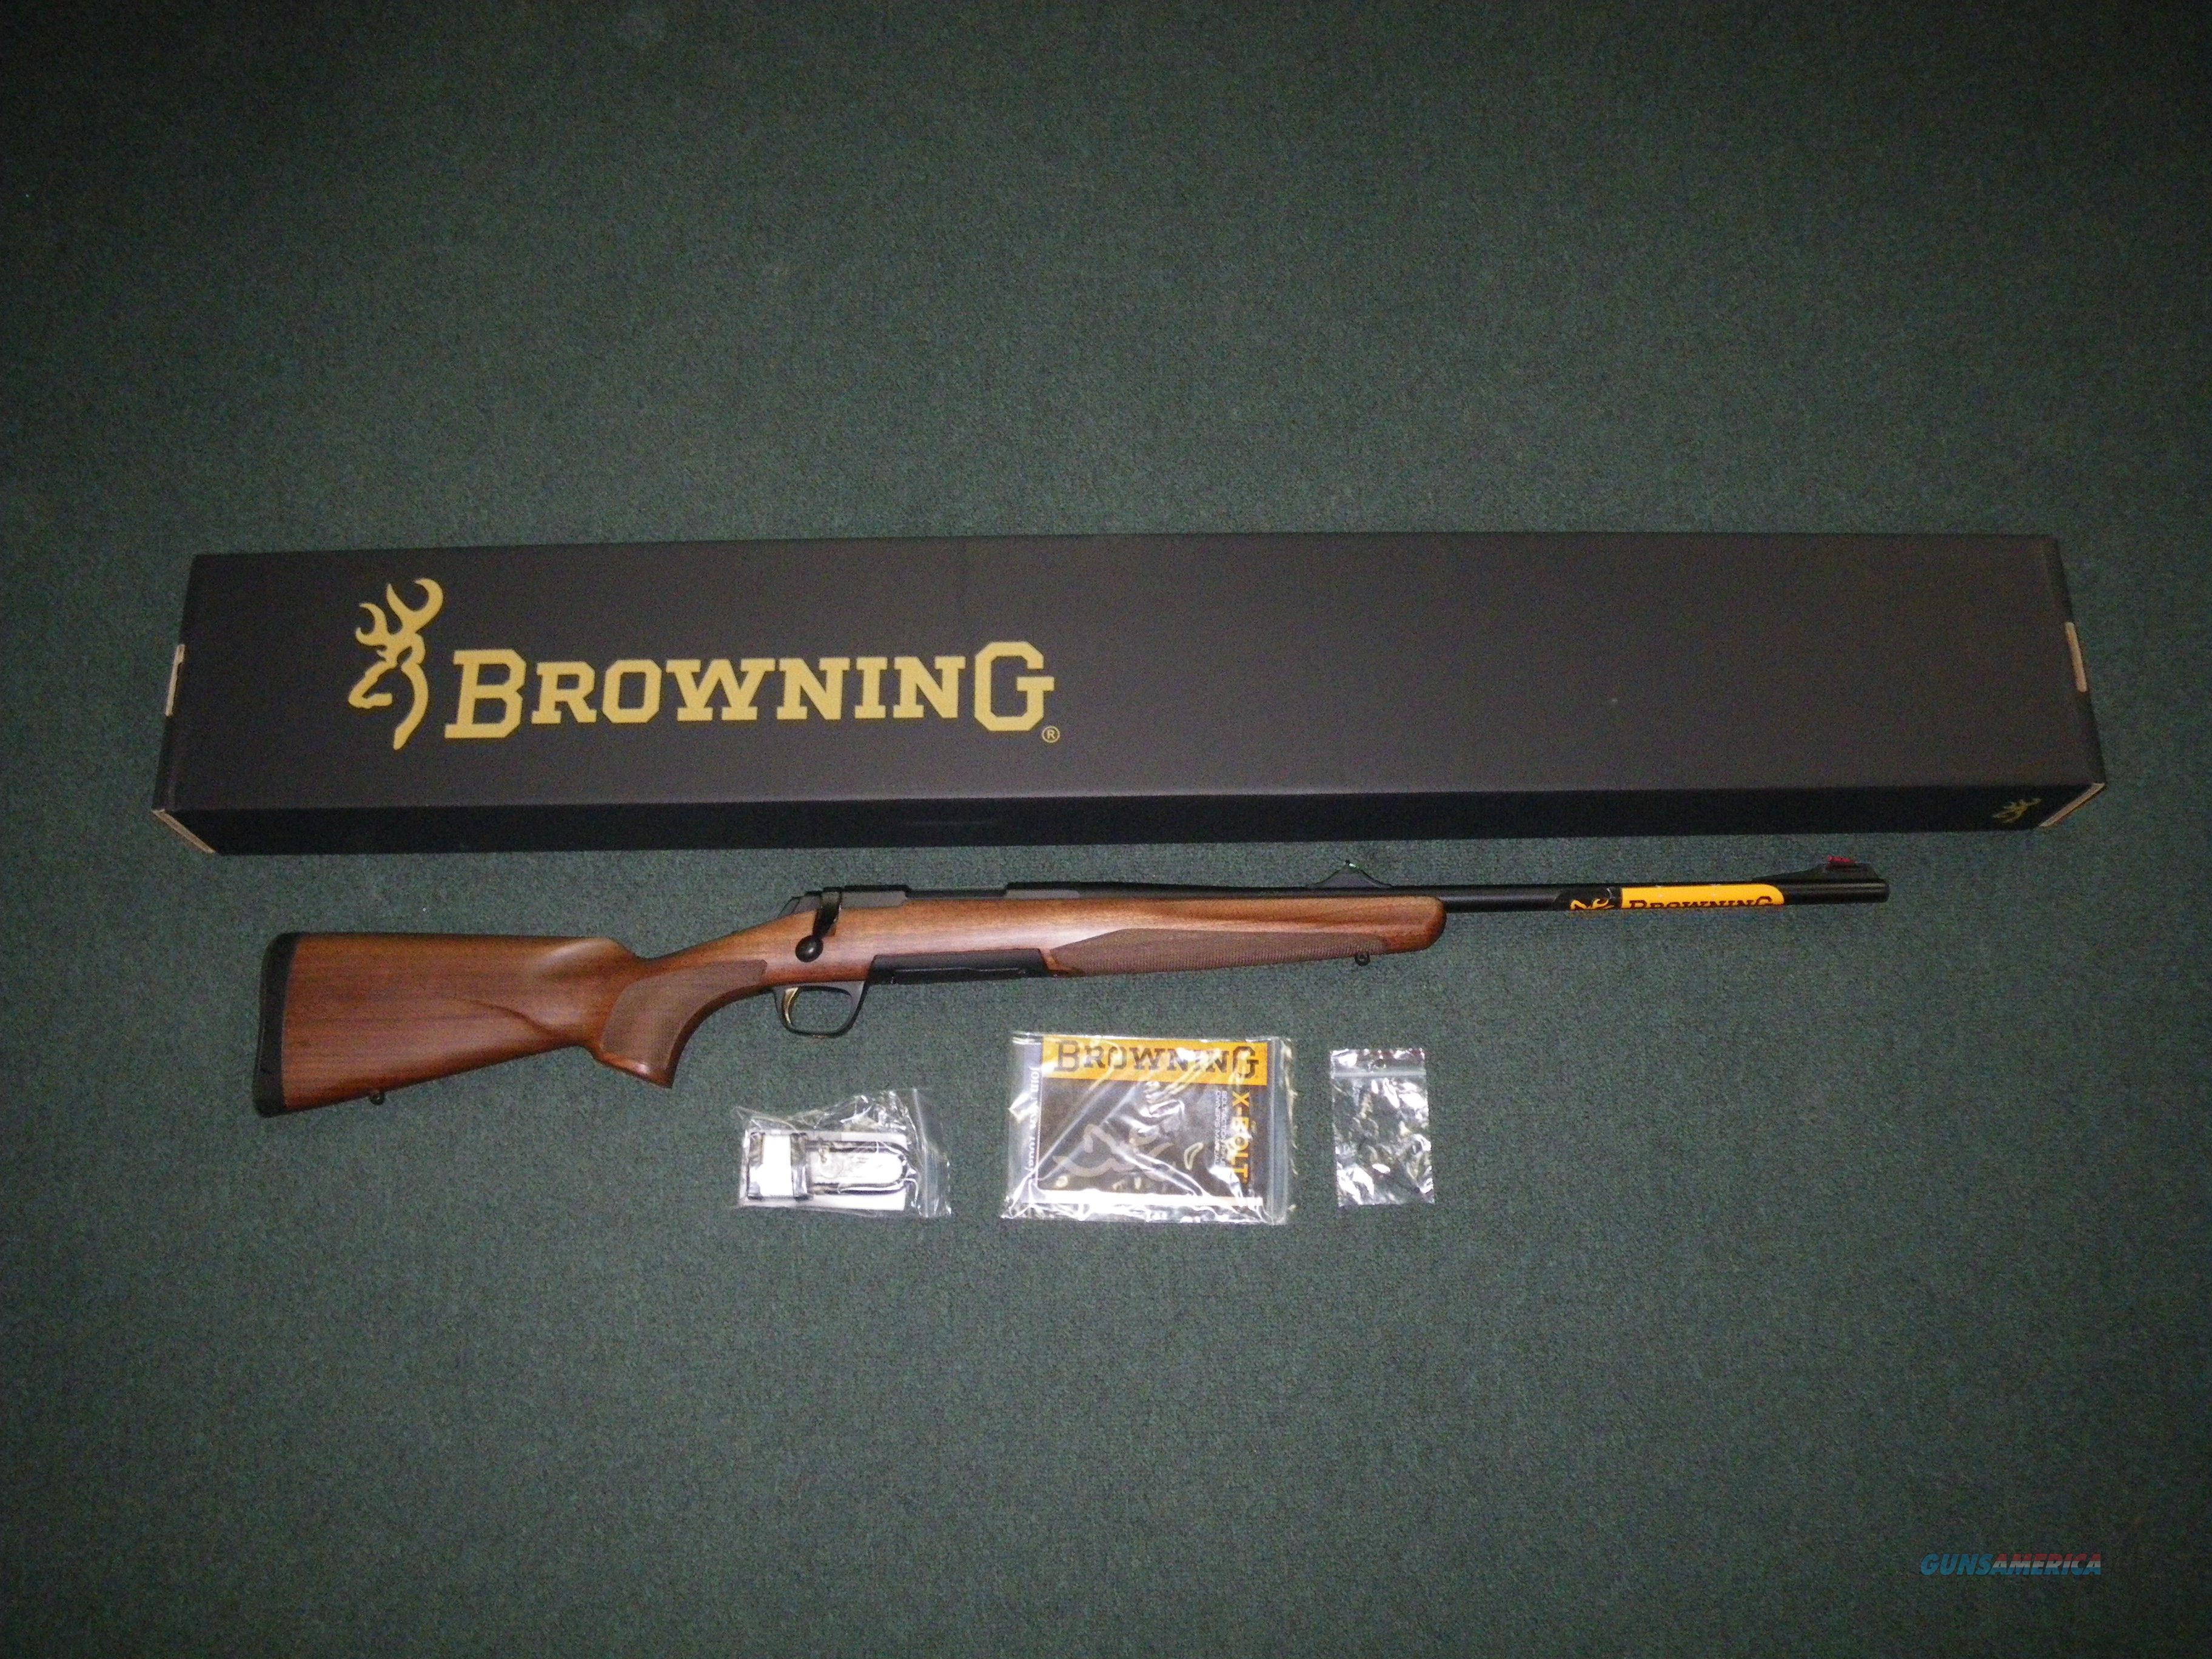 "Browning X-Bolt Hunter Open Sights 308 Win 22"" NEW #035208118  Guns > Rifles > Browning Rifles > Bolt Action > Hunting > Blue"